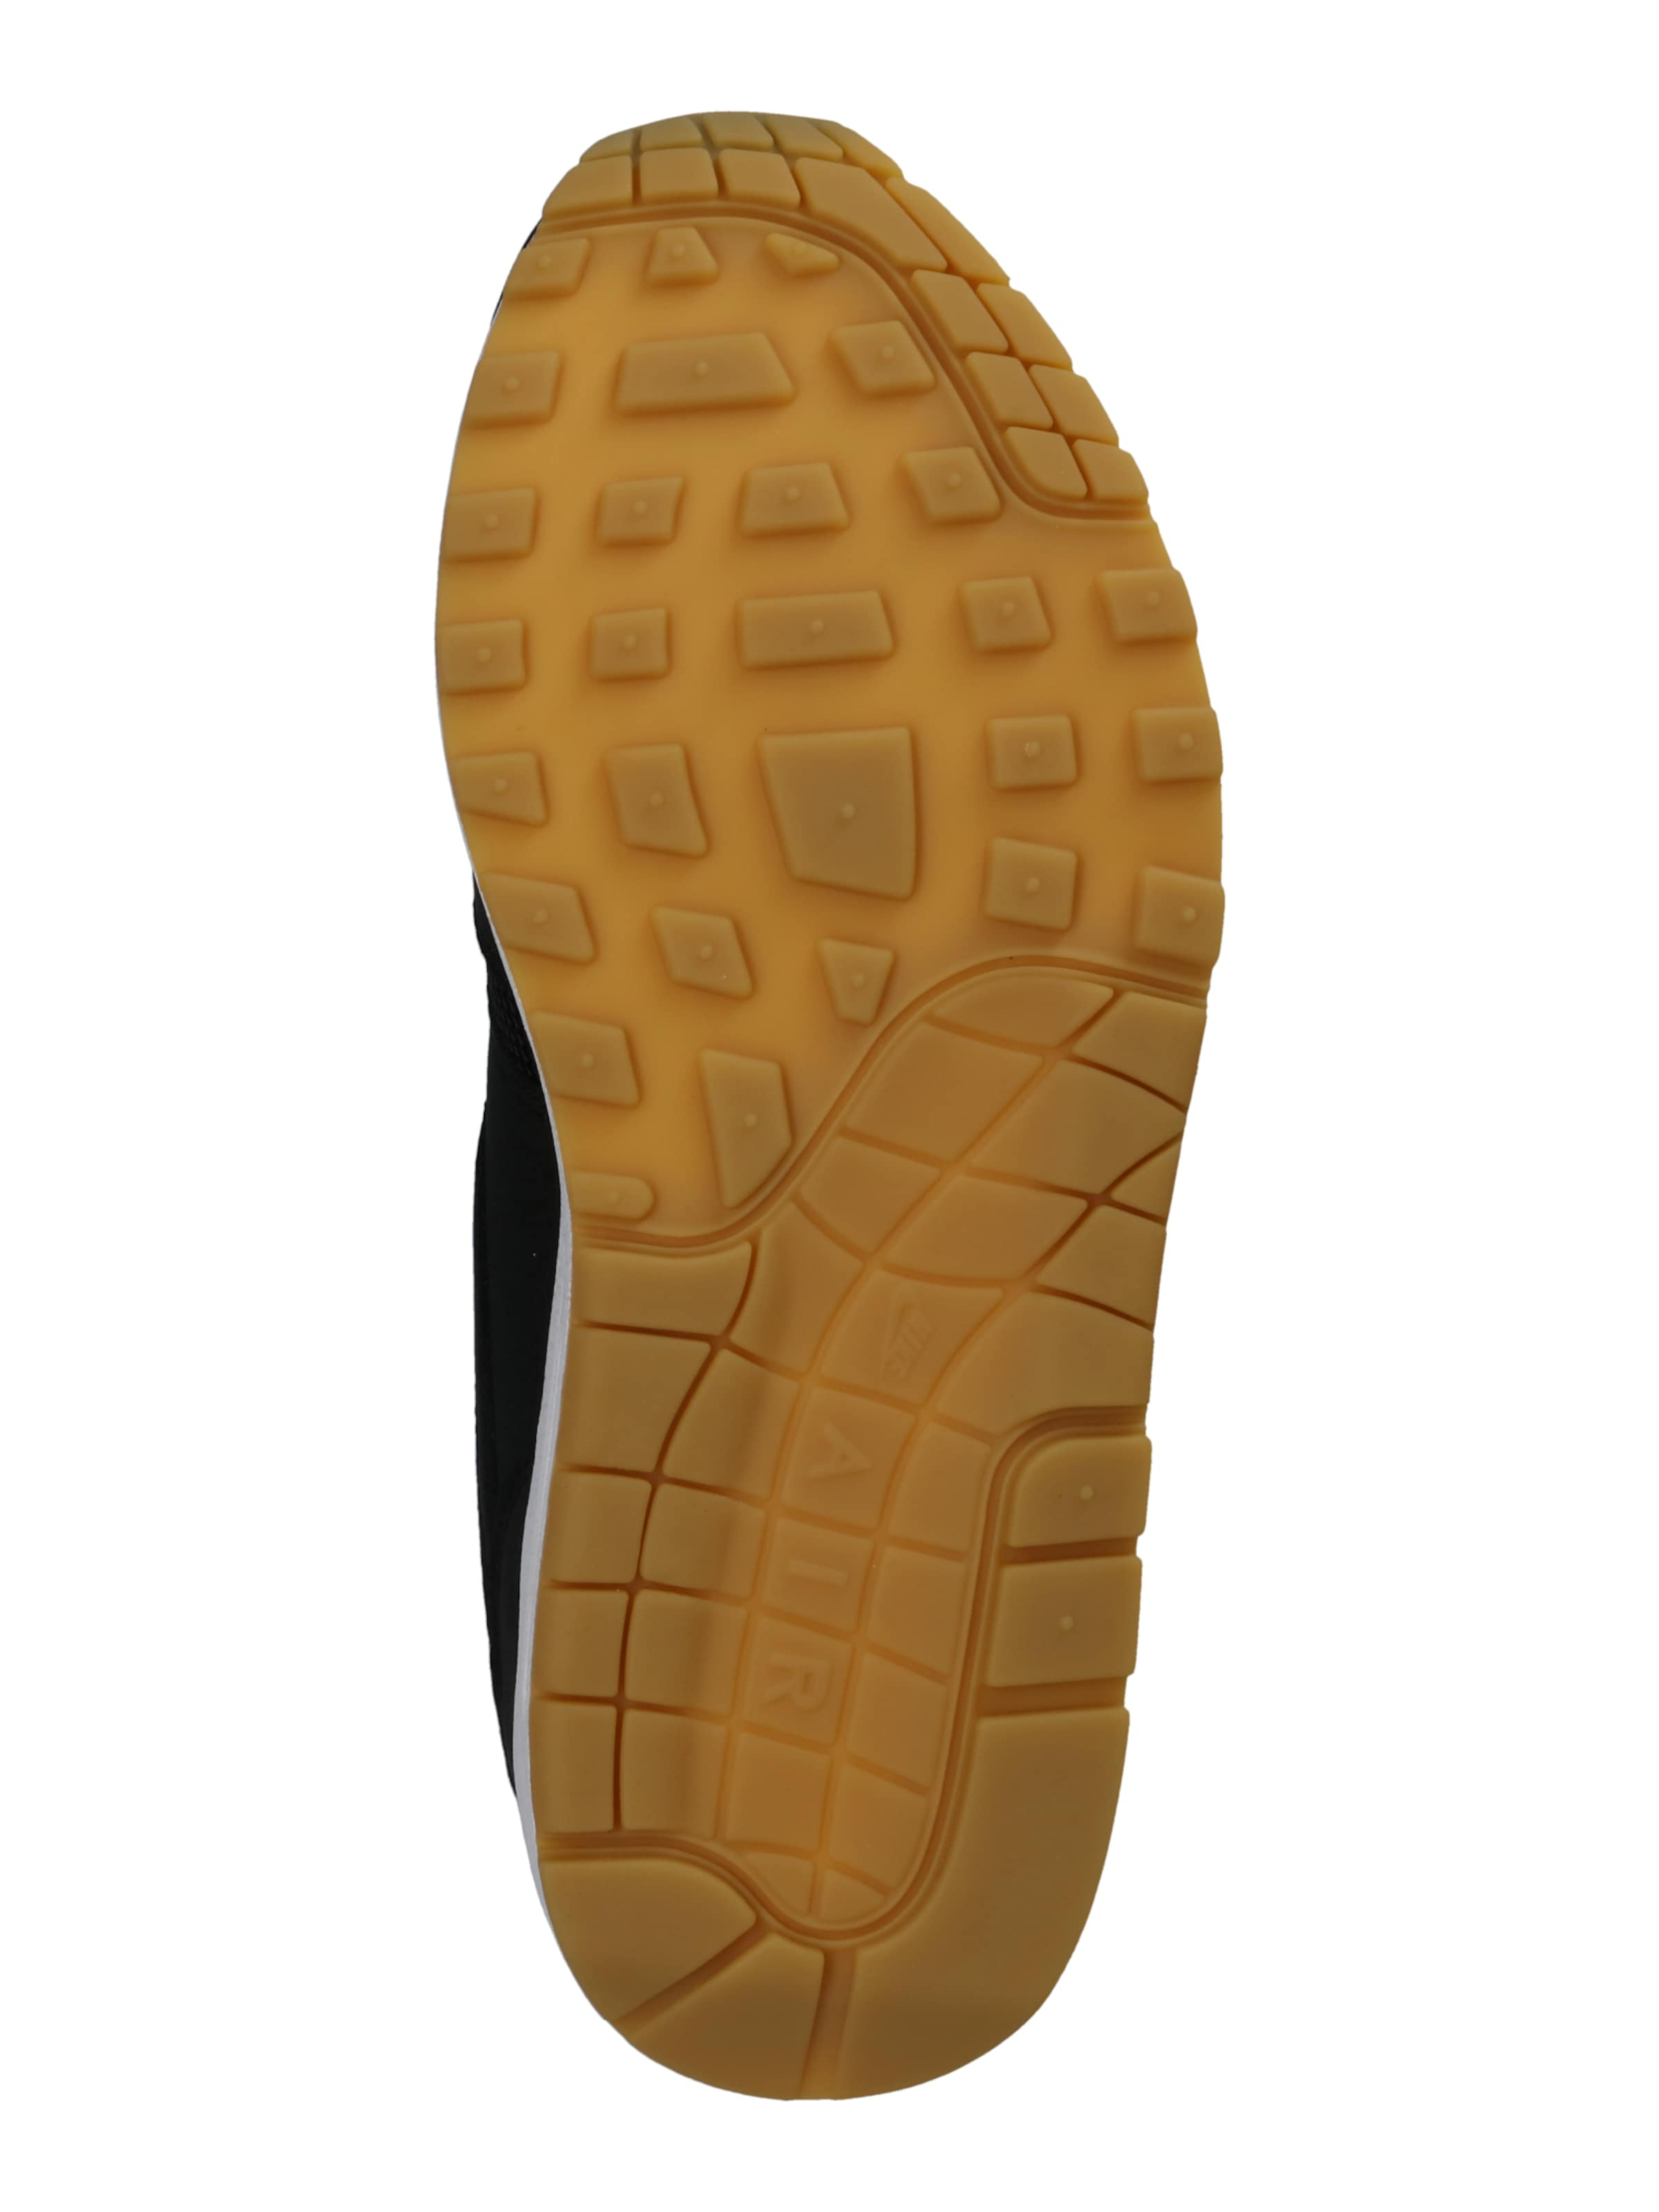 Nike Sportswear Turnschuhe 'WMNS AIR MAX Textil 1 Textil MAX Billige Herren- und Damenschuhe 406356